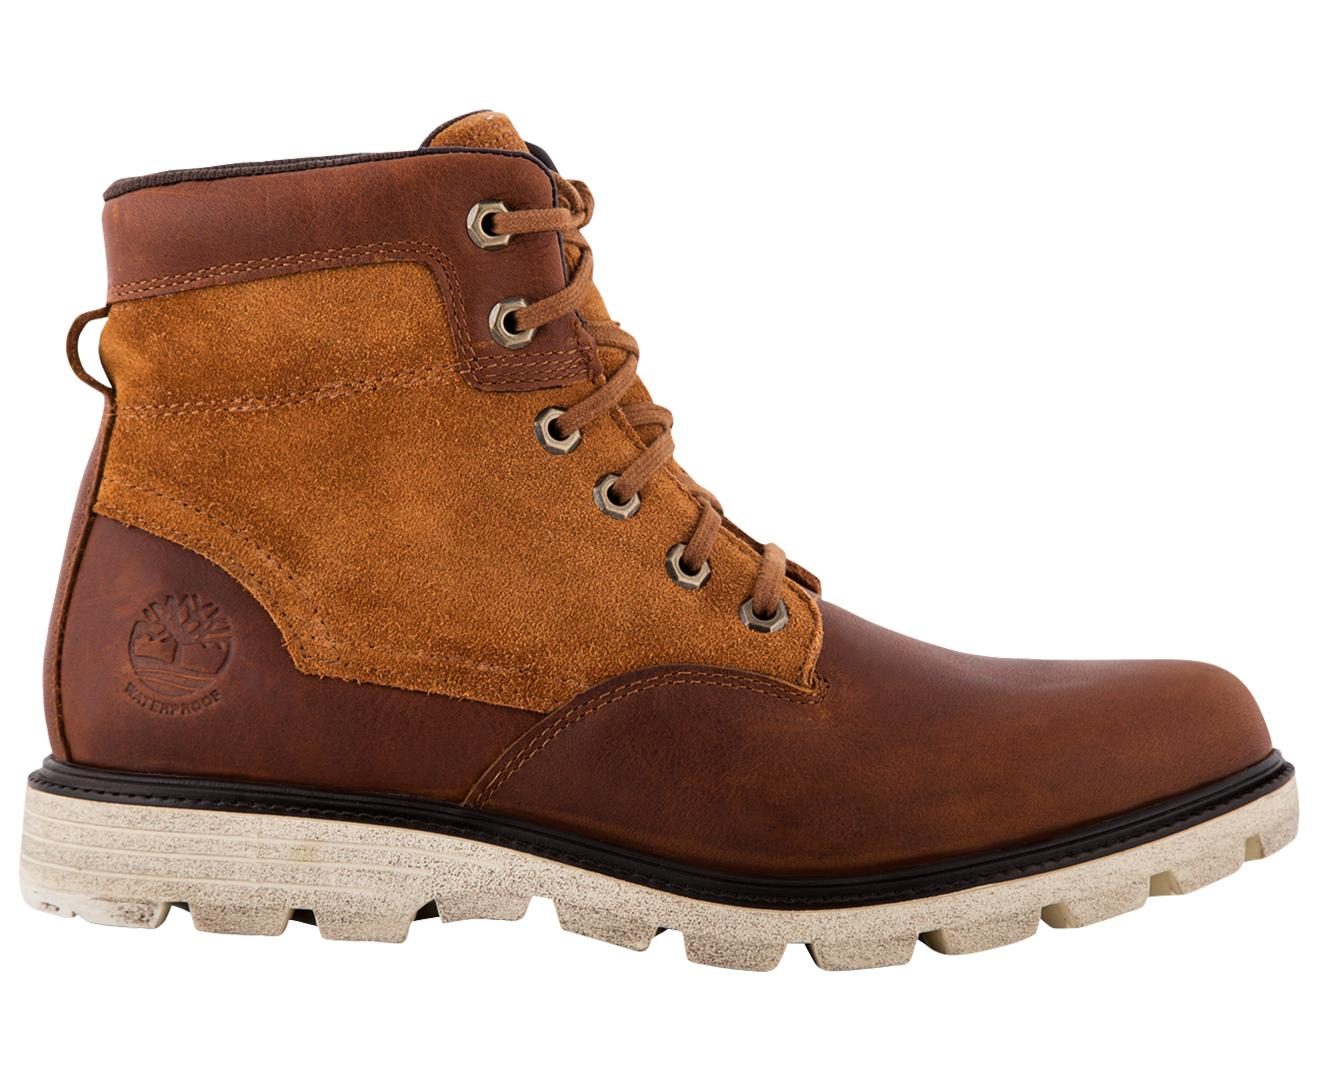 Timberland Men's Walden 6 Inch Park Boot Brown